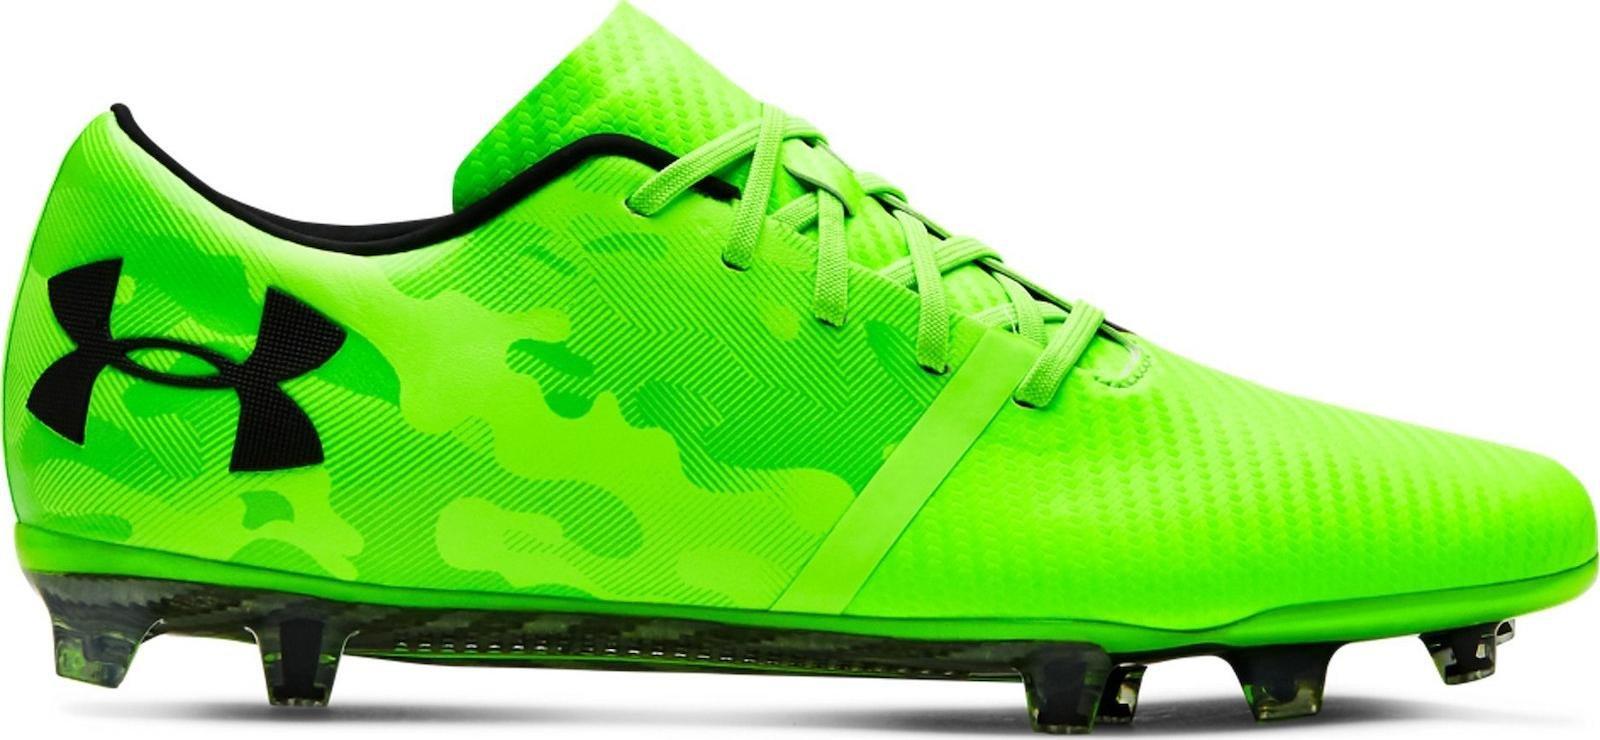 Football shoes Under Armour UA